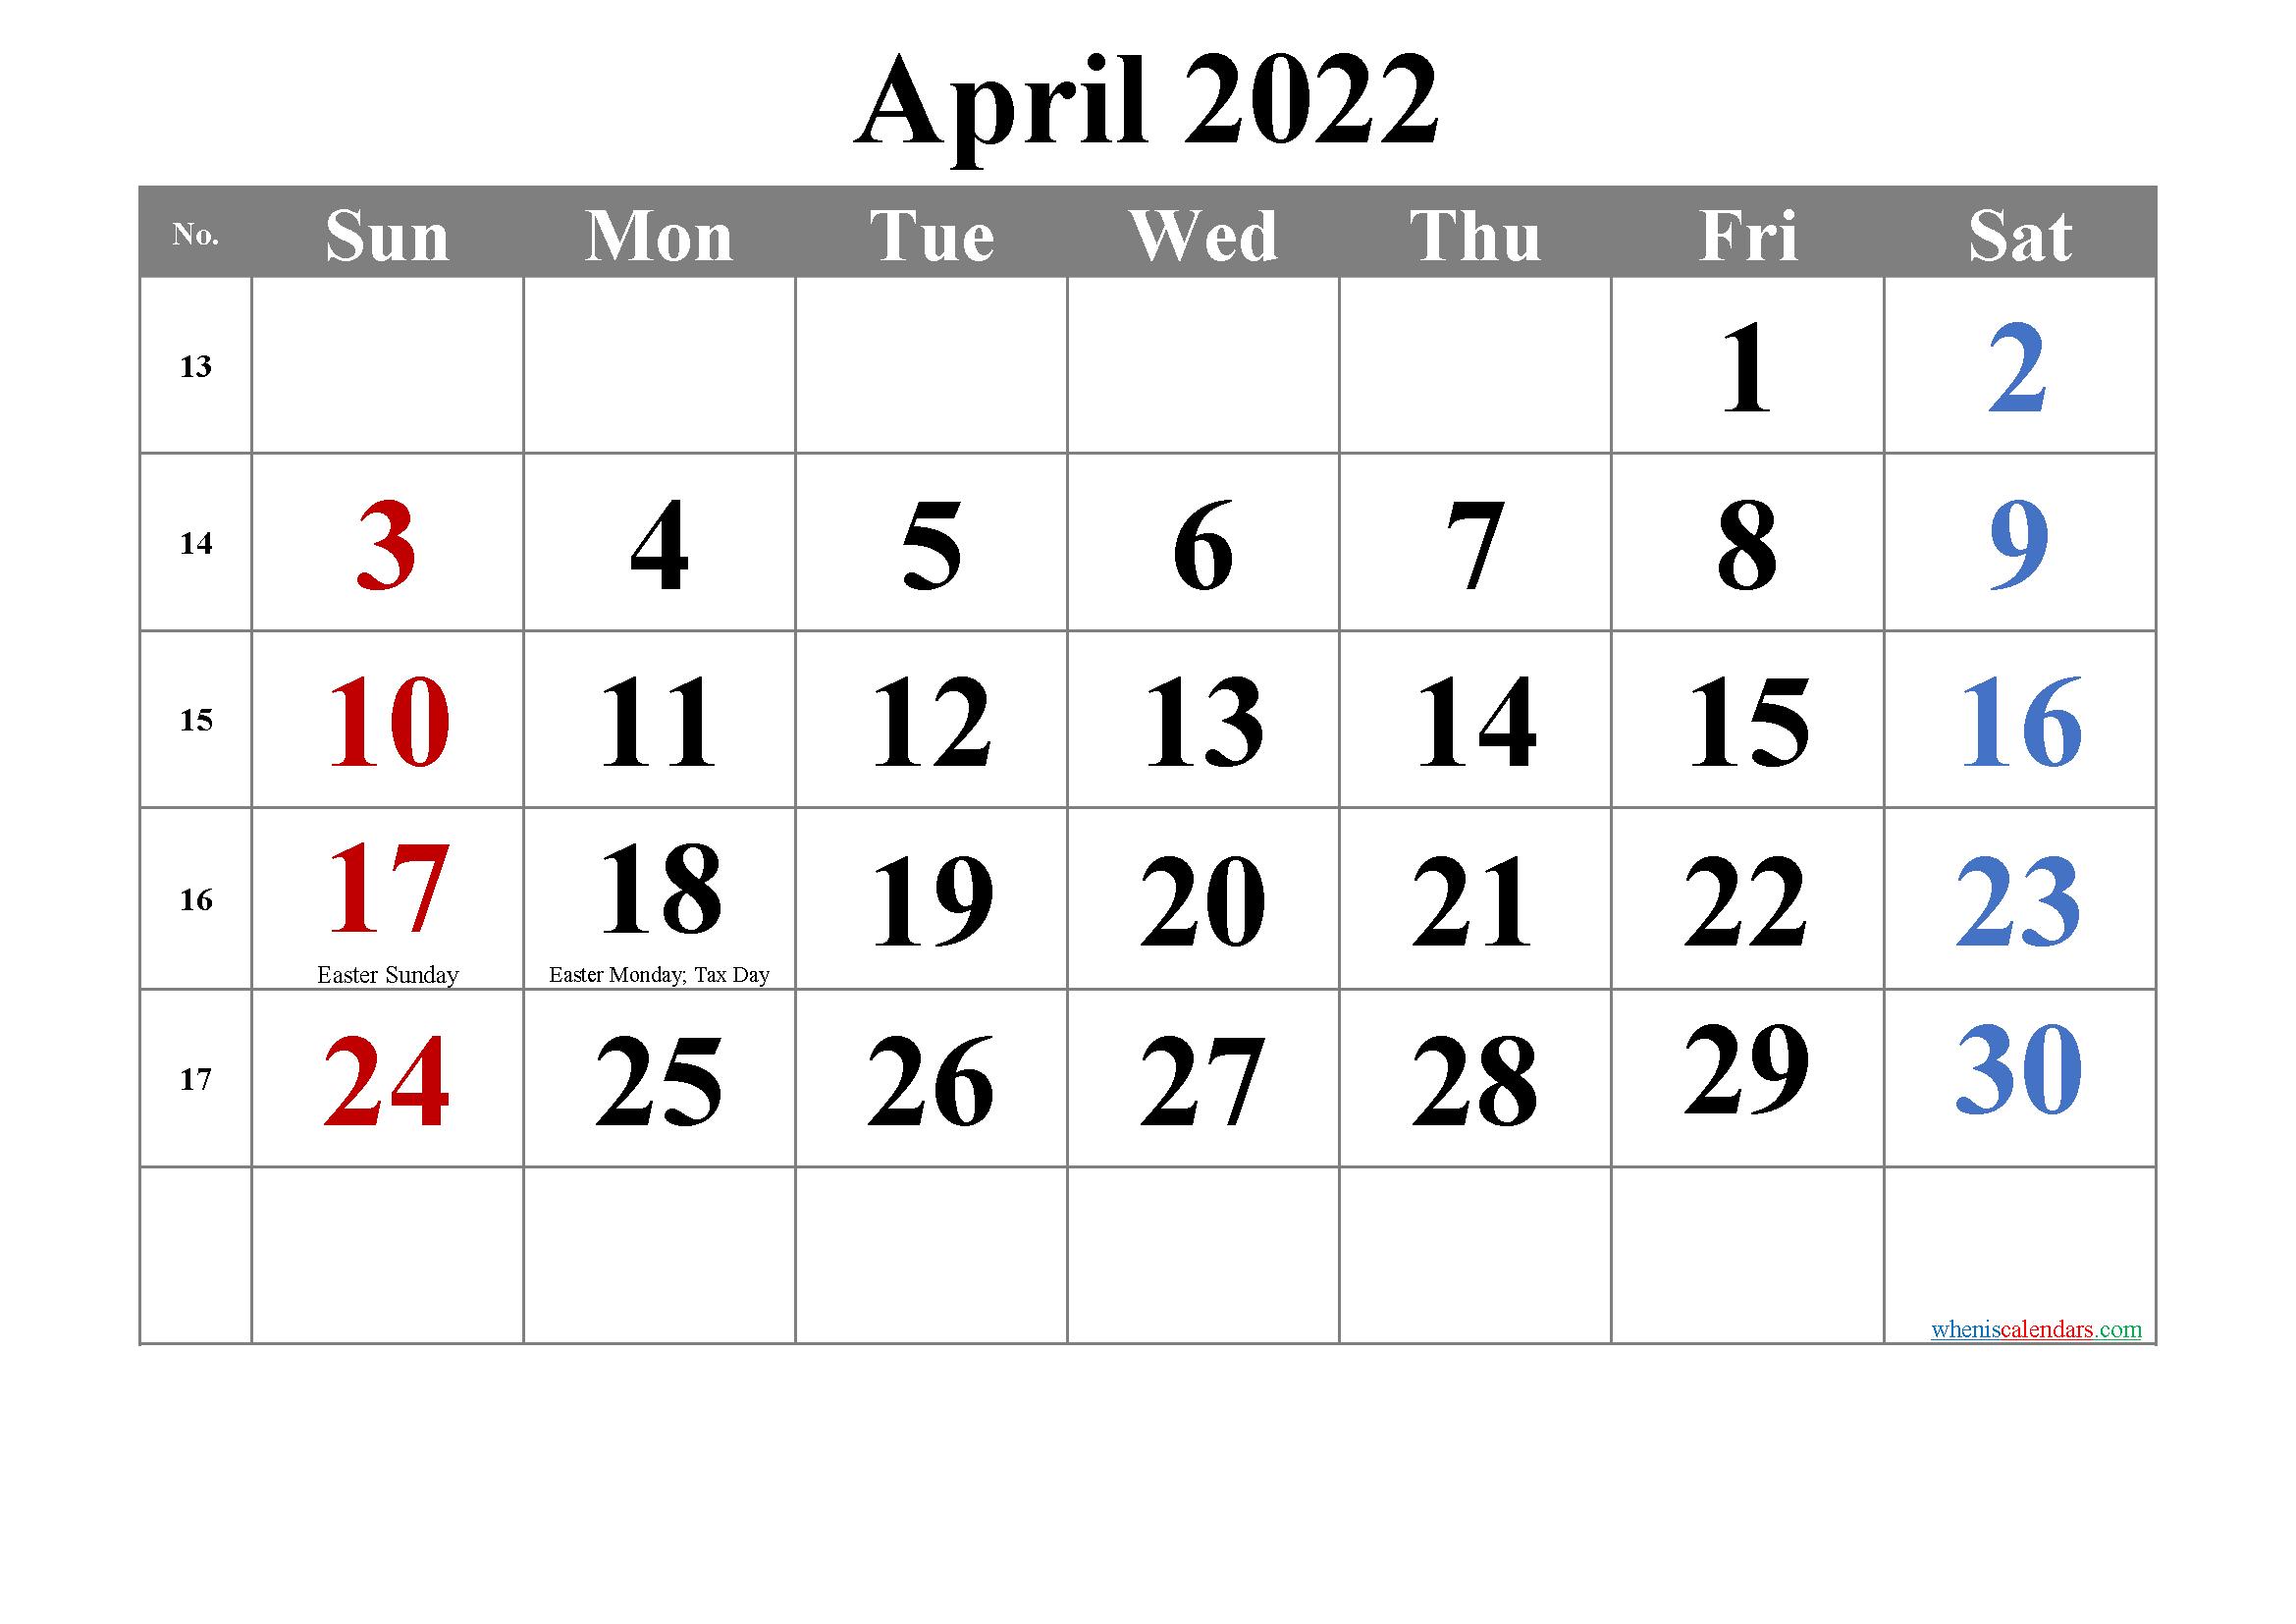 Free Printable April 2022 Calendar - Free Printable 2021 with regard to Printable April 2022 Calendar